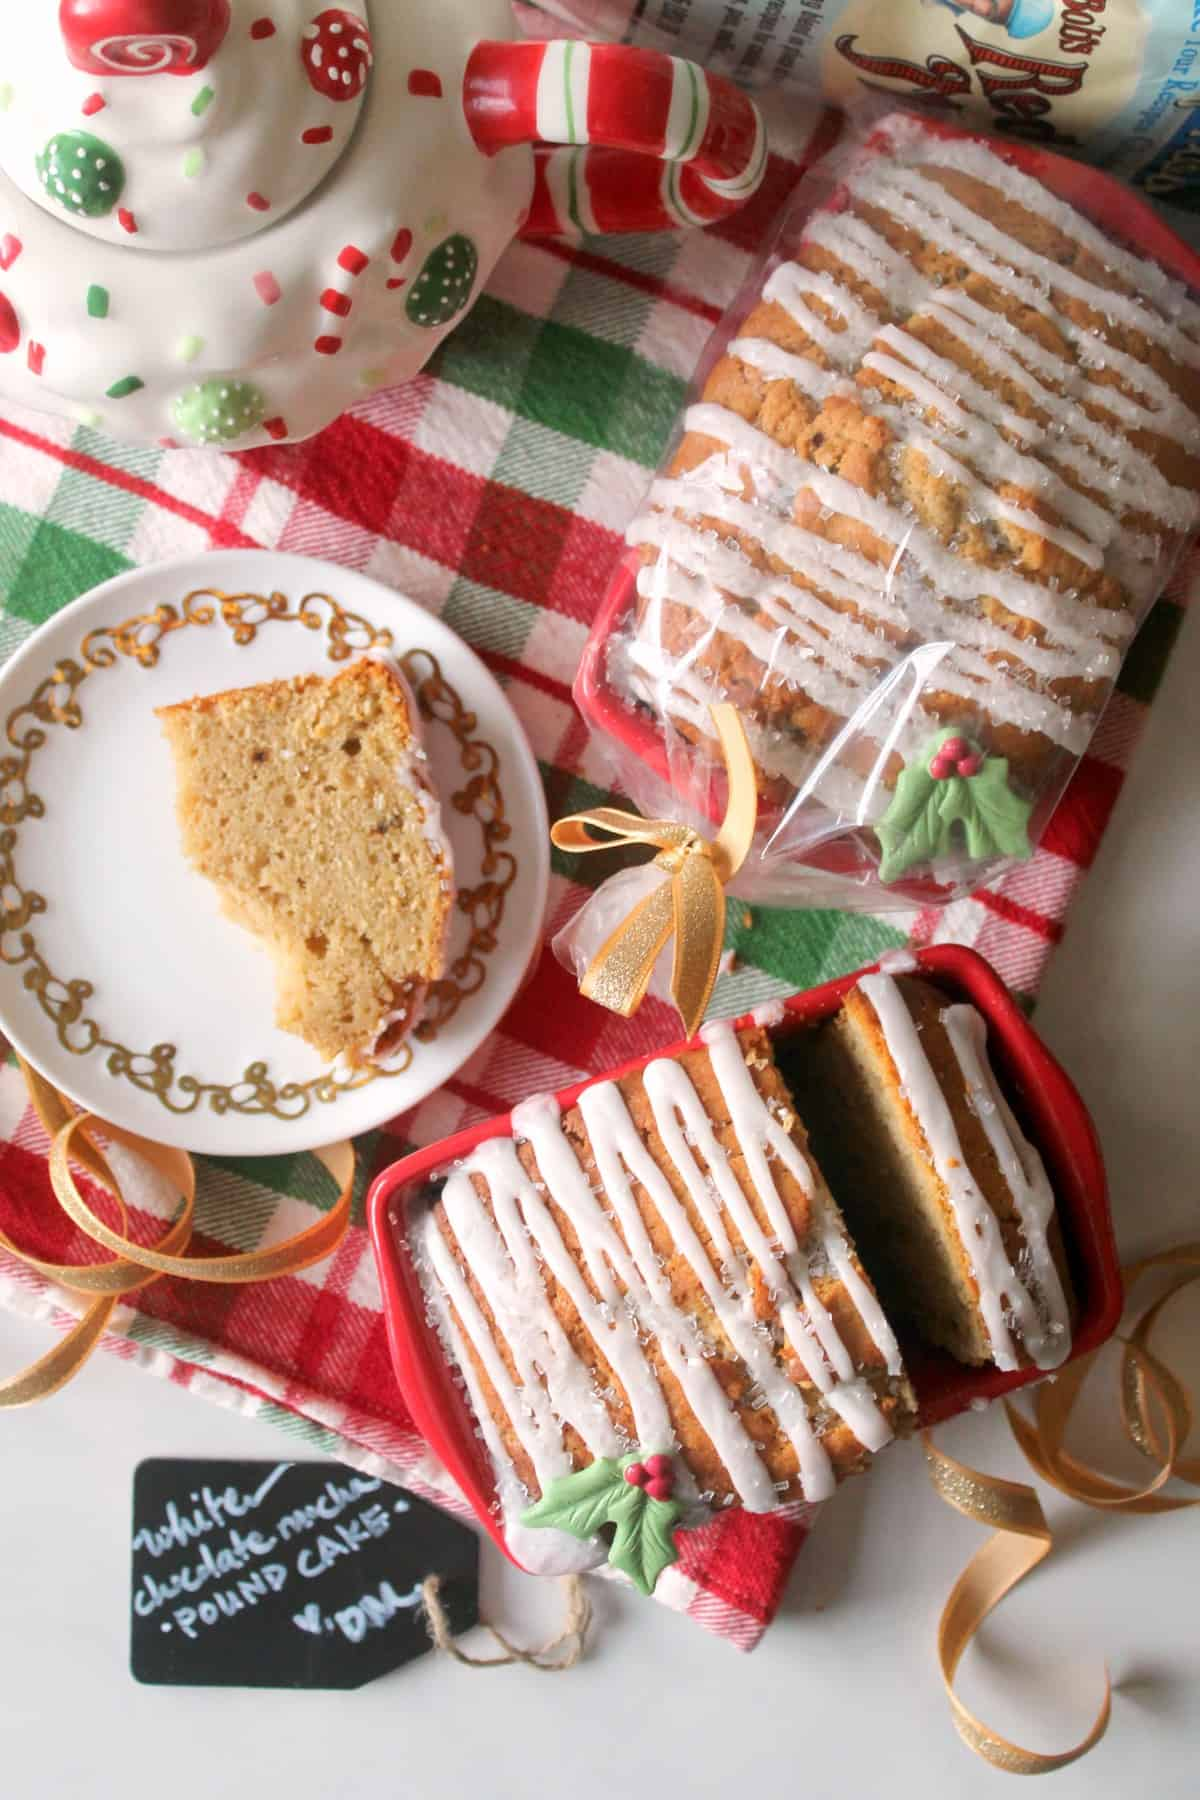 White Chocolate Mocha Pound Cakes via The Kitchen Prep. A perfect DIY holiday gift!